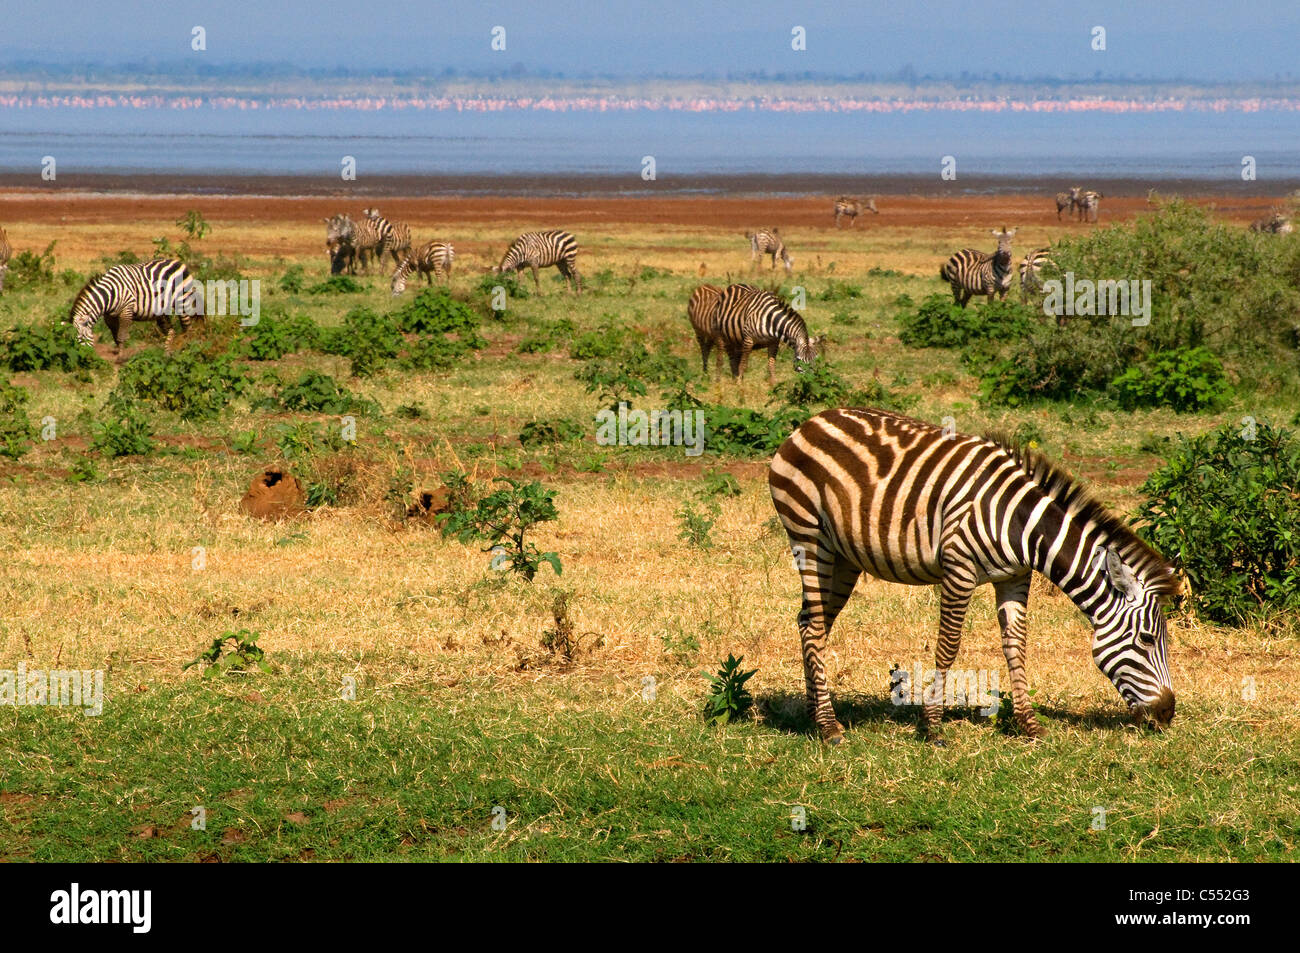 Herd of Zebras grazing in a field, Lake Manyara National Park, Tanzania Stock Photo